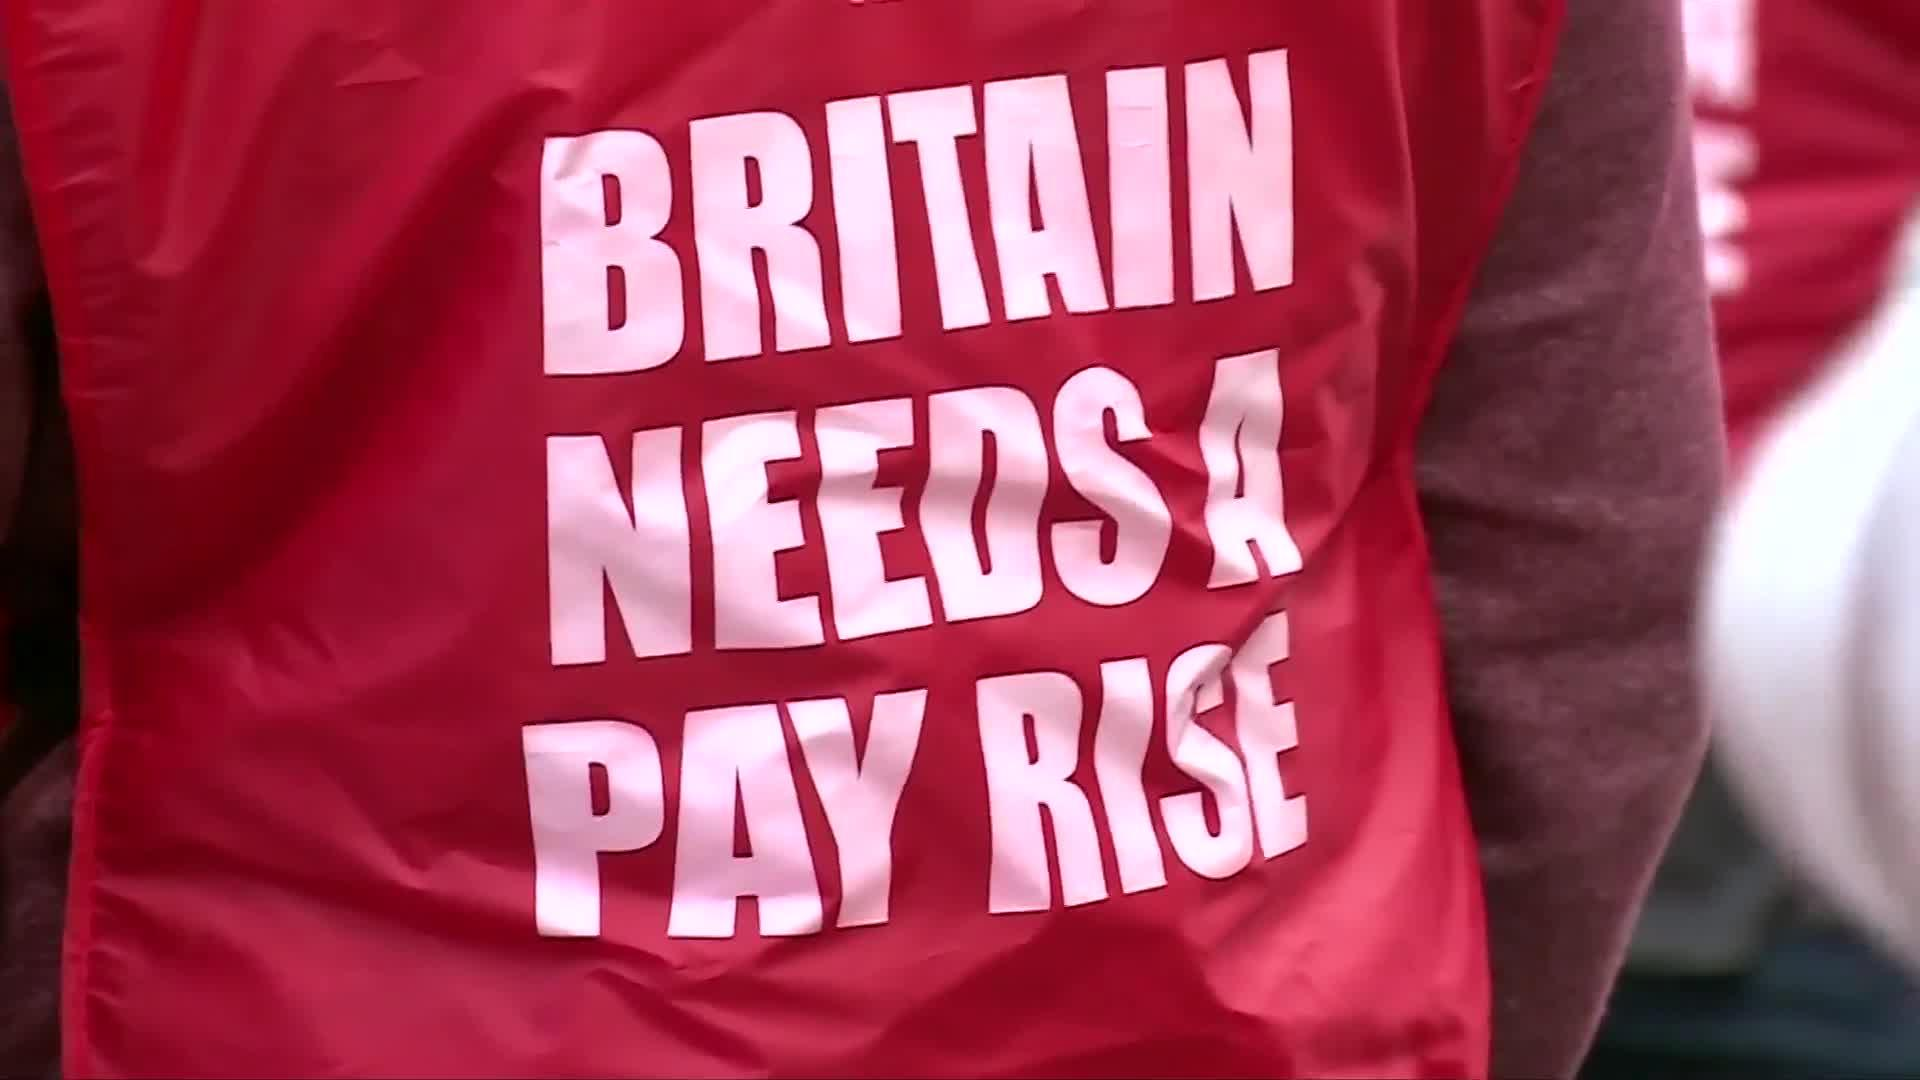 Argos warehouse workers to strike amid redundancy arrangements row